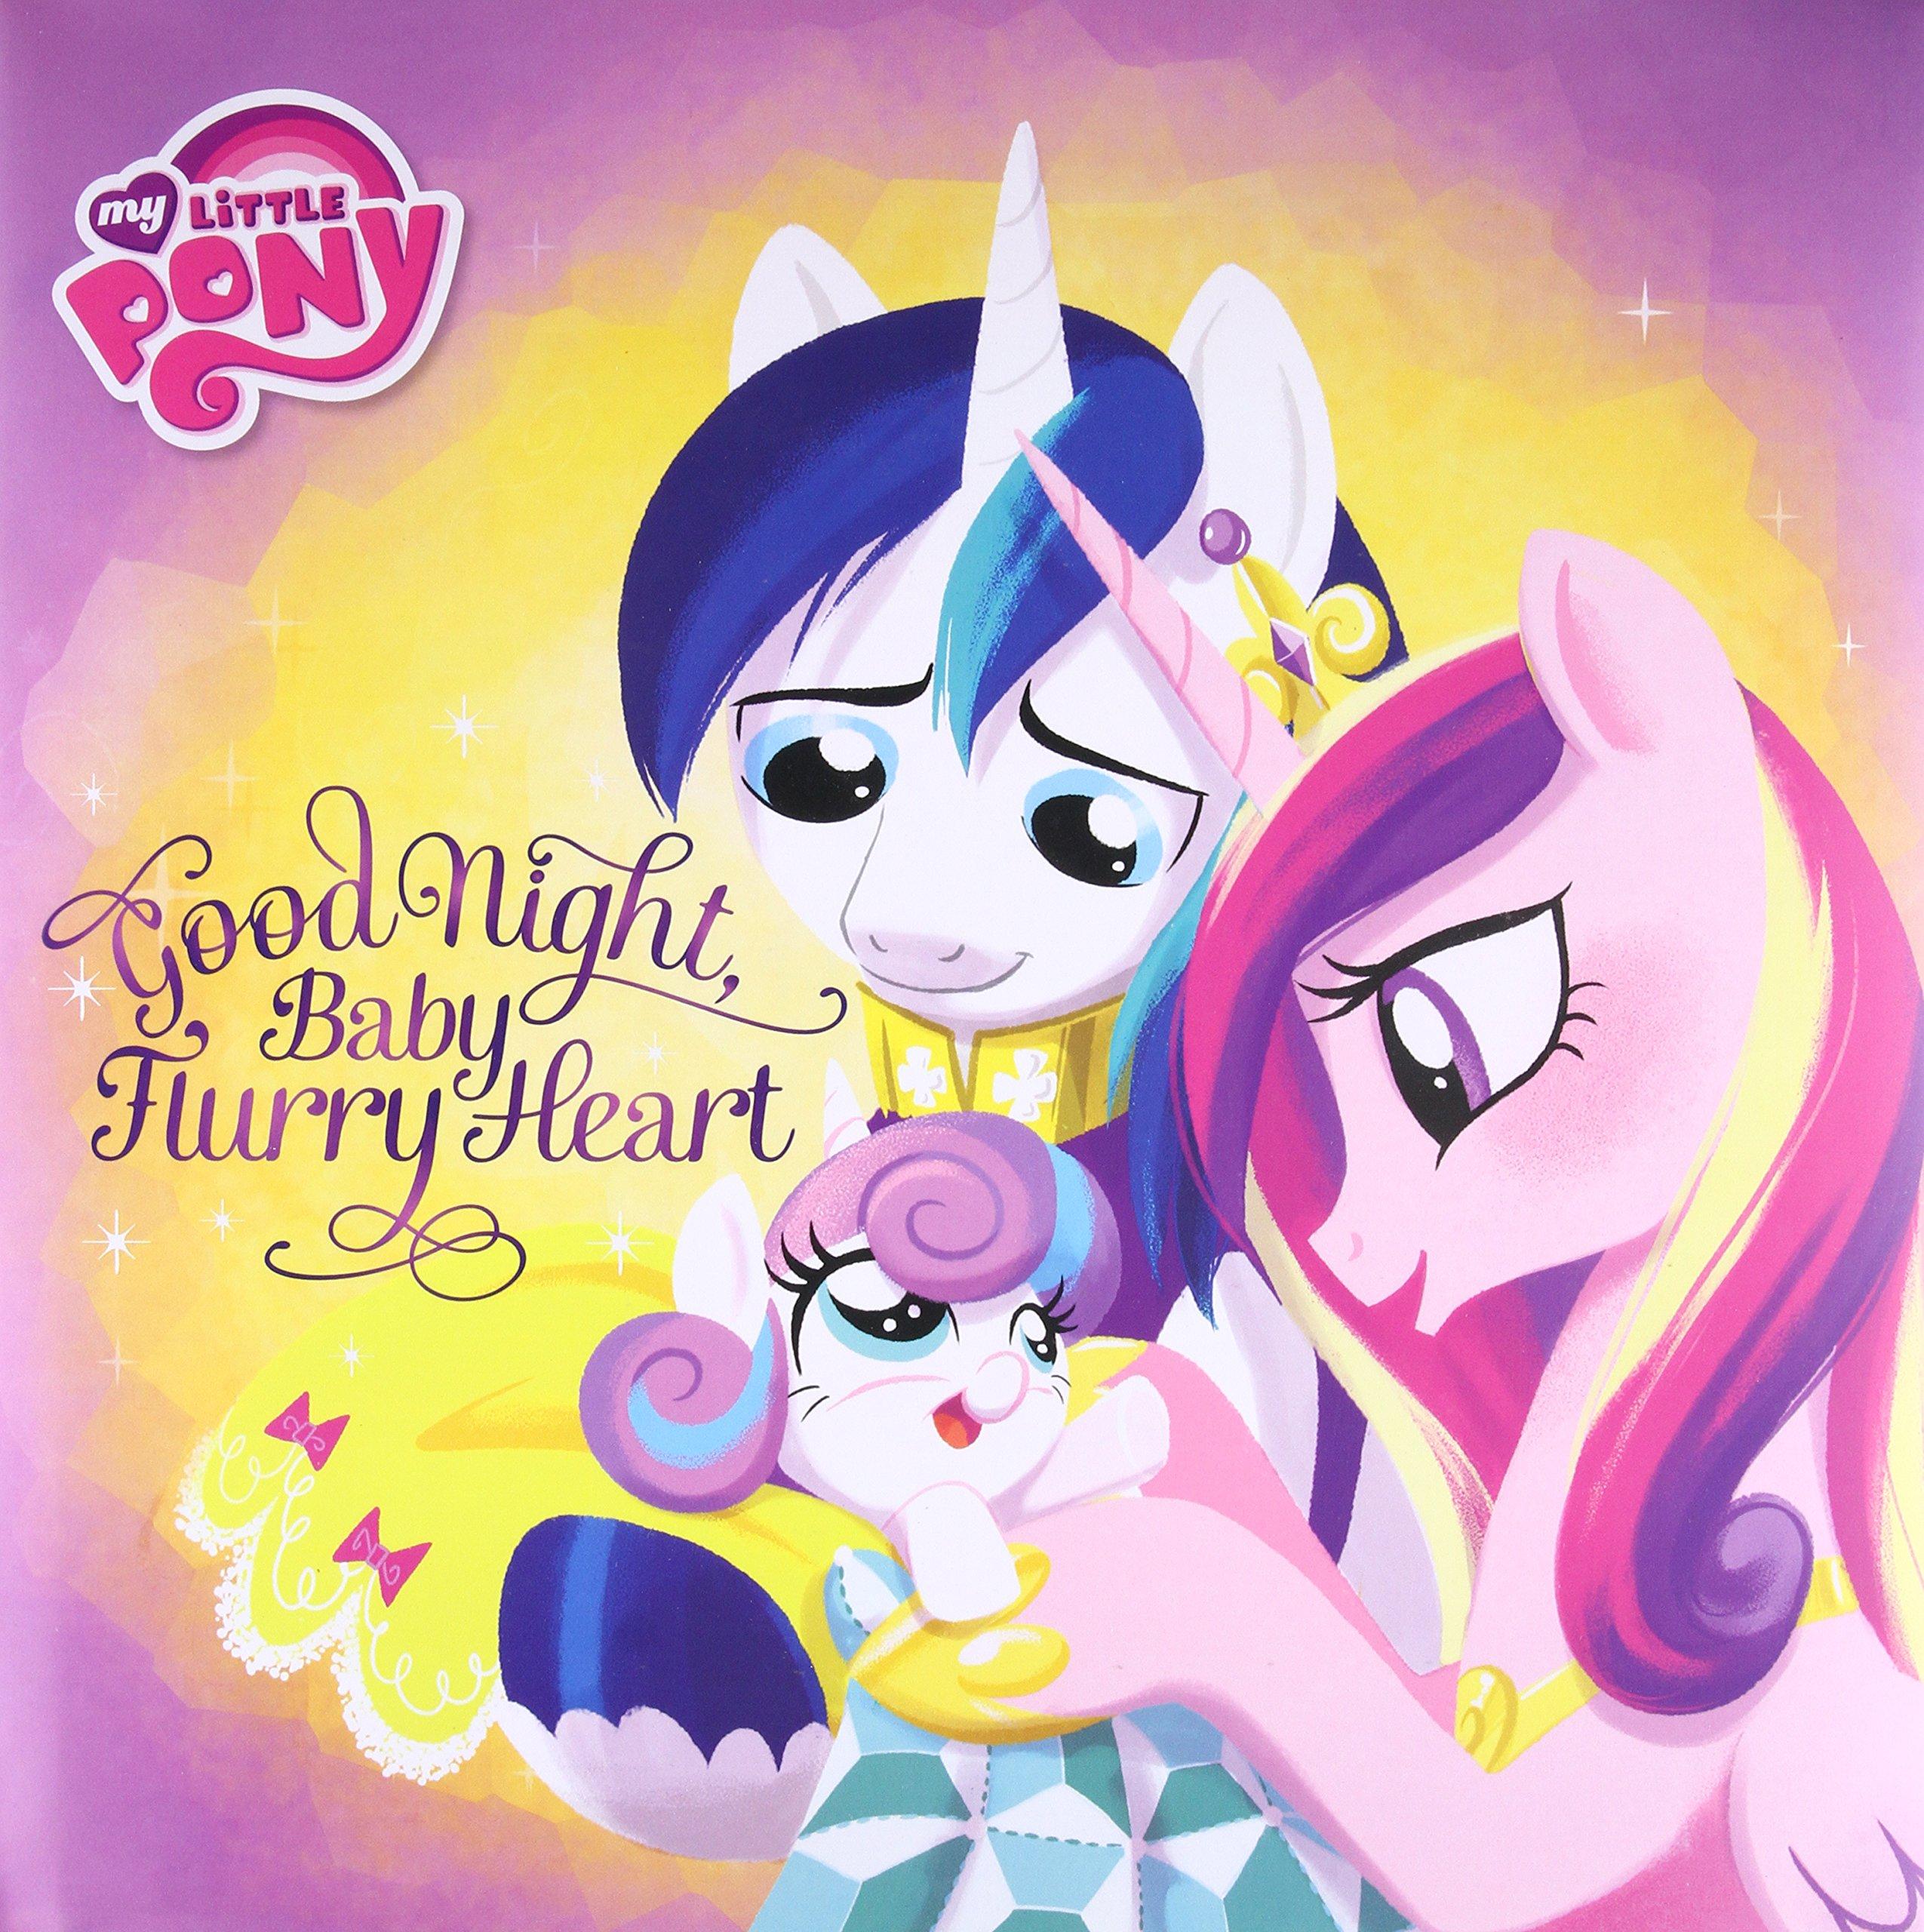 my-little-pony-good-night-baby-flurry-heart